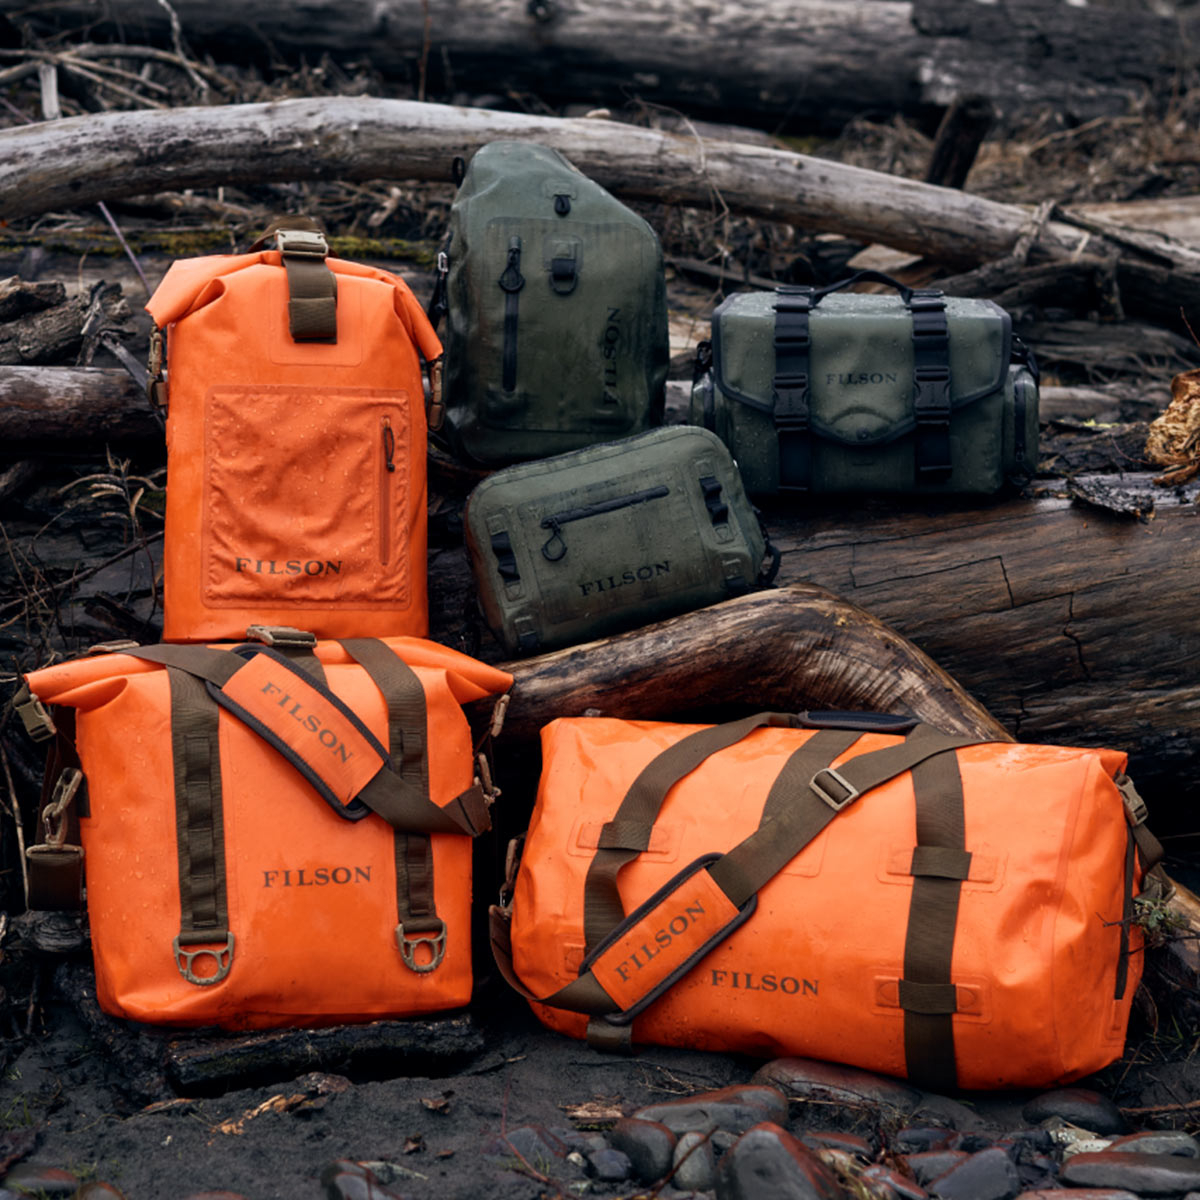 Filson Dry Duffle Bag Medium Flame, hält Ihre Ausrüstung bei jedem Wetter trocken